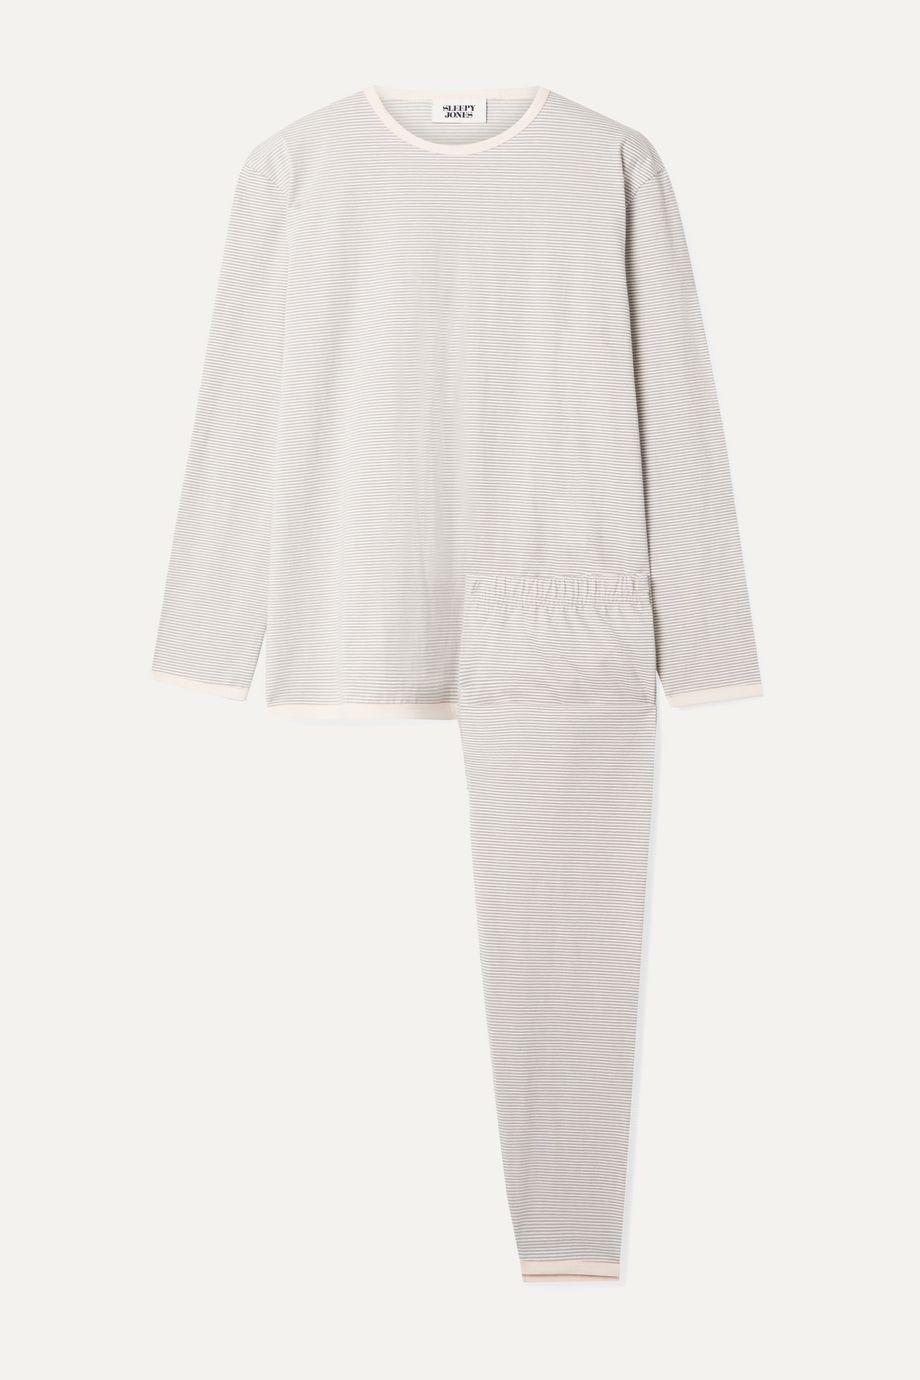 Sleepy Jones Brigitte striped cotton-jersey pajama set